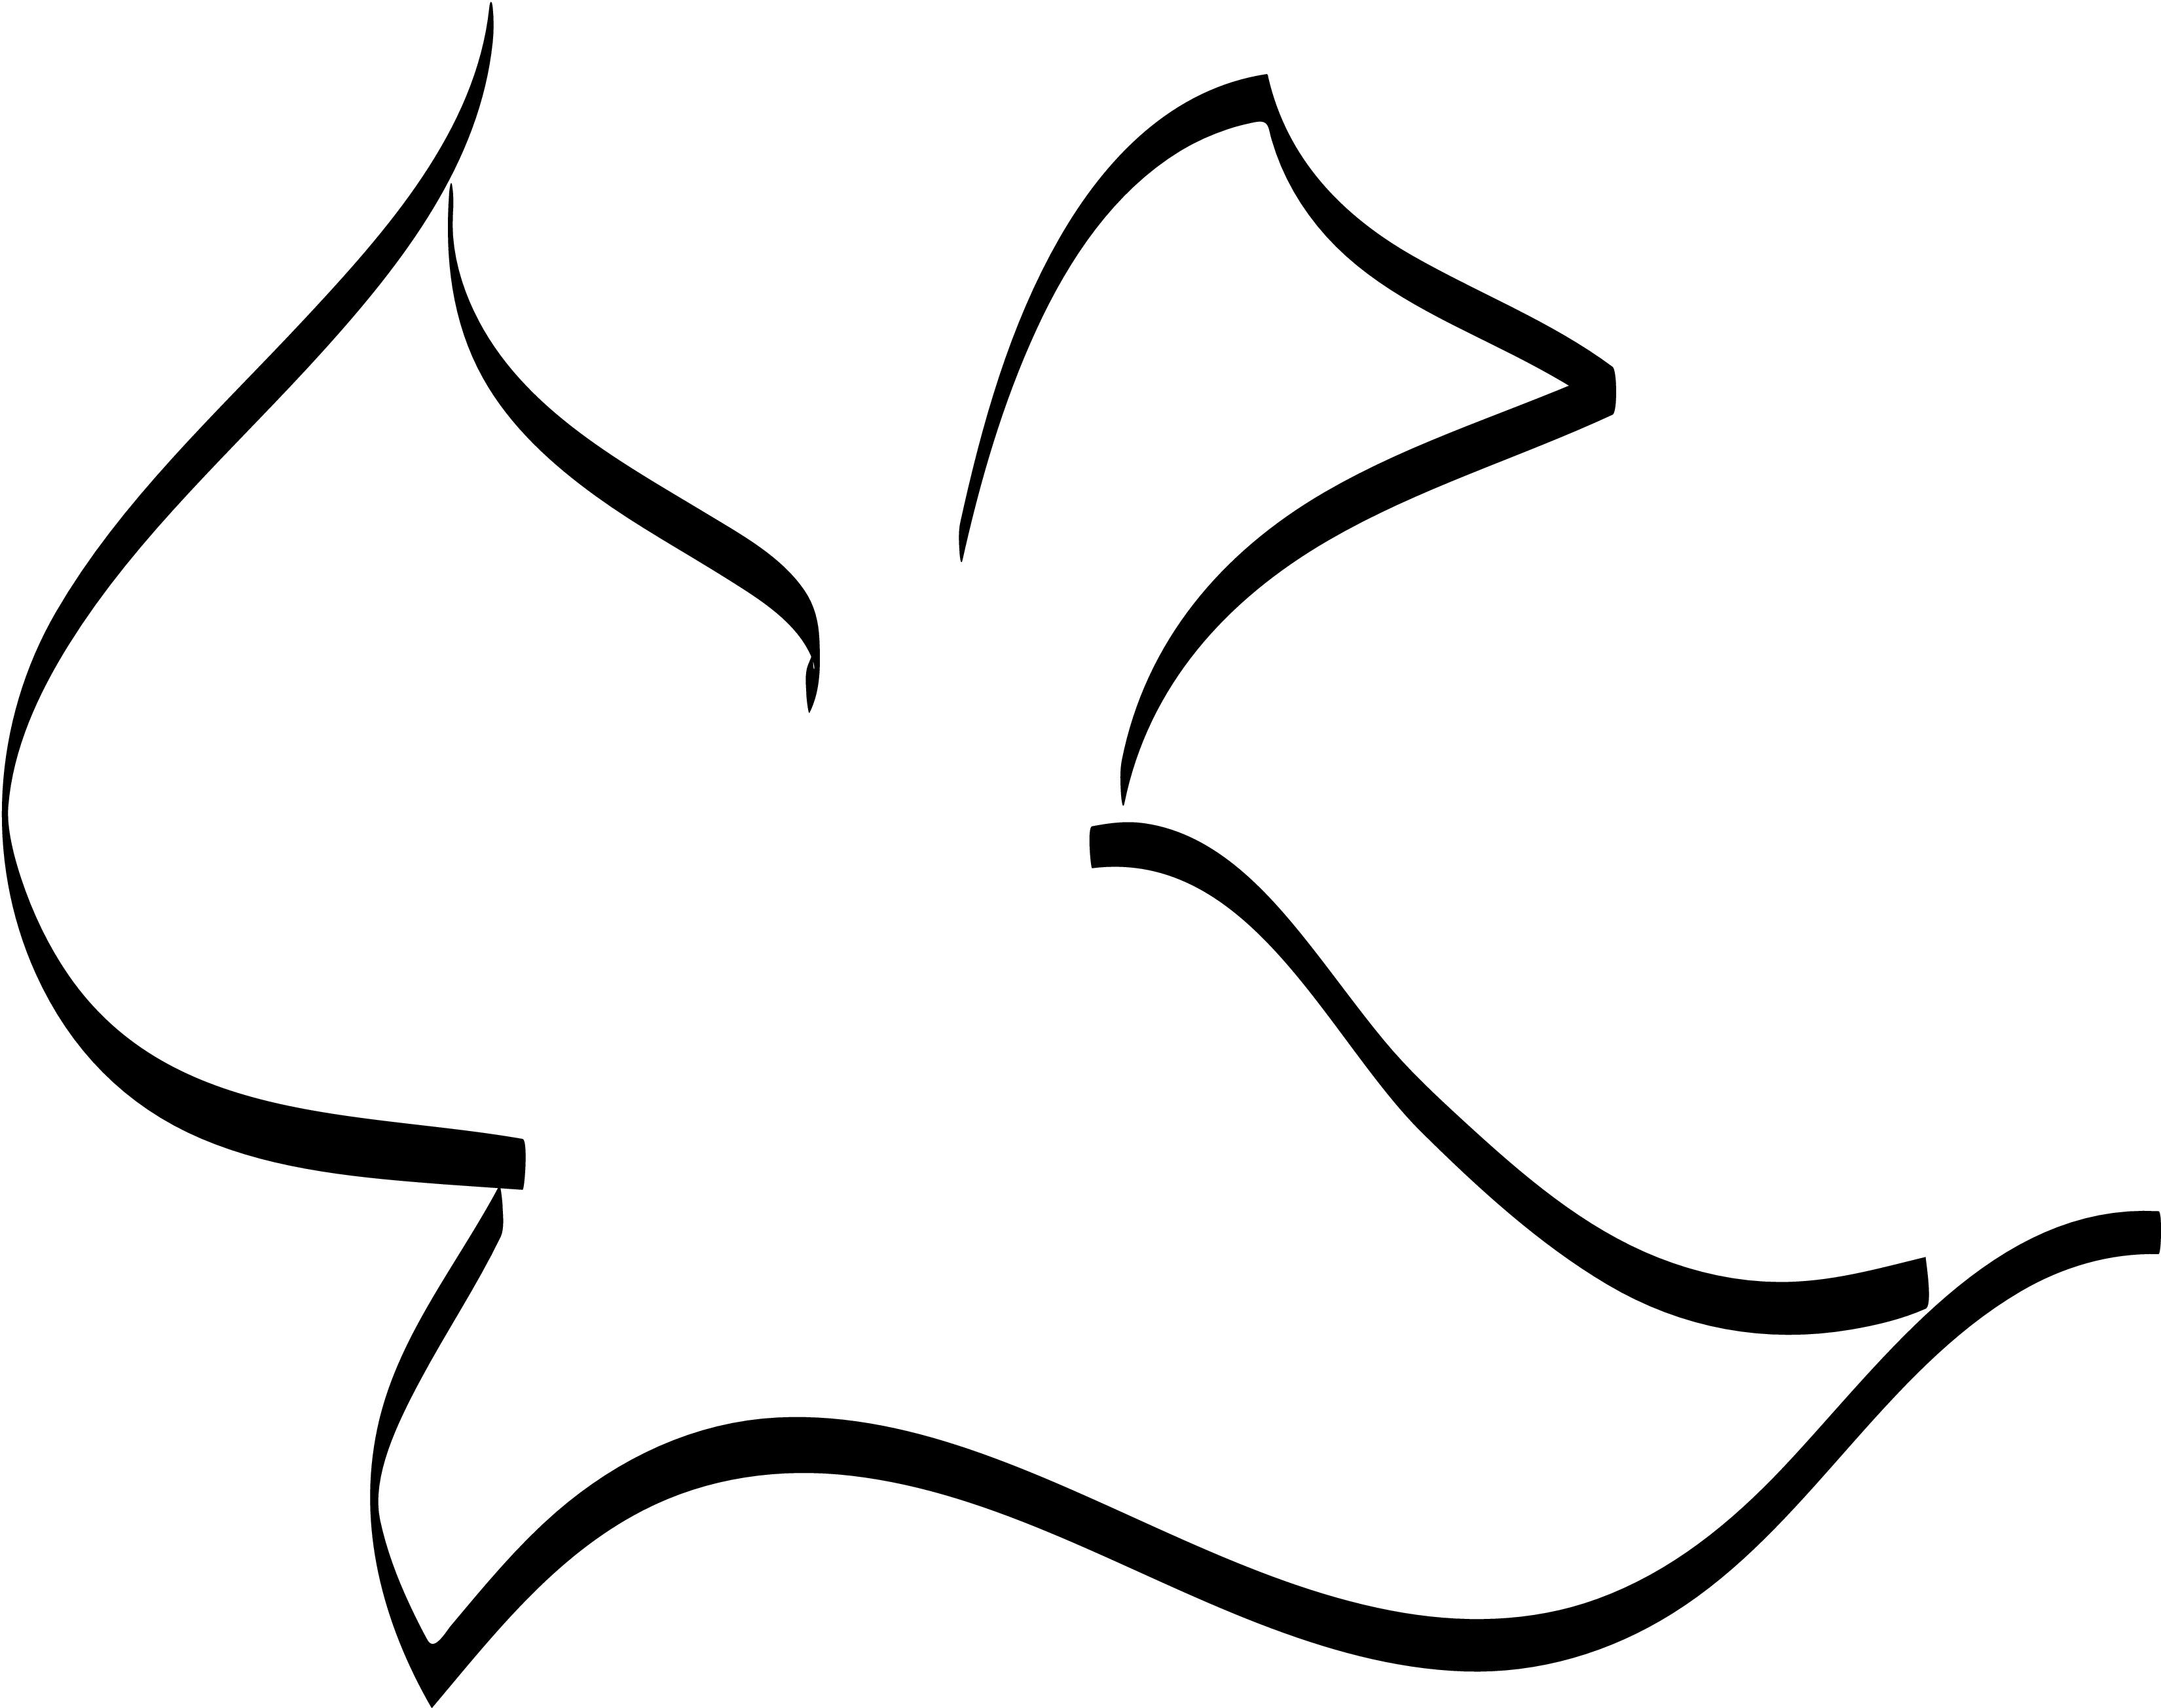 Holy spirit dove clipart black and white - photo#4